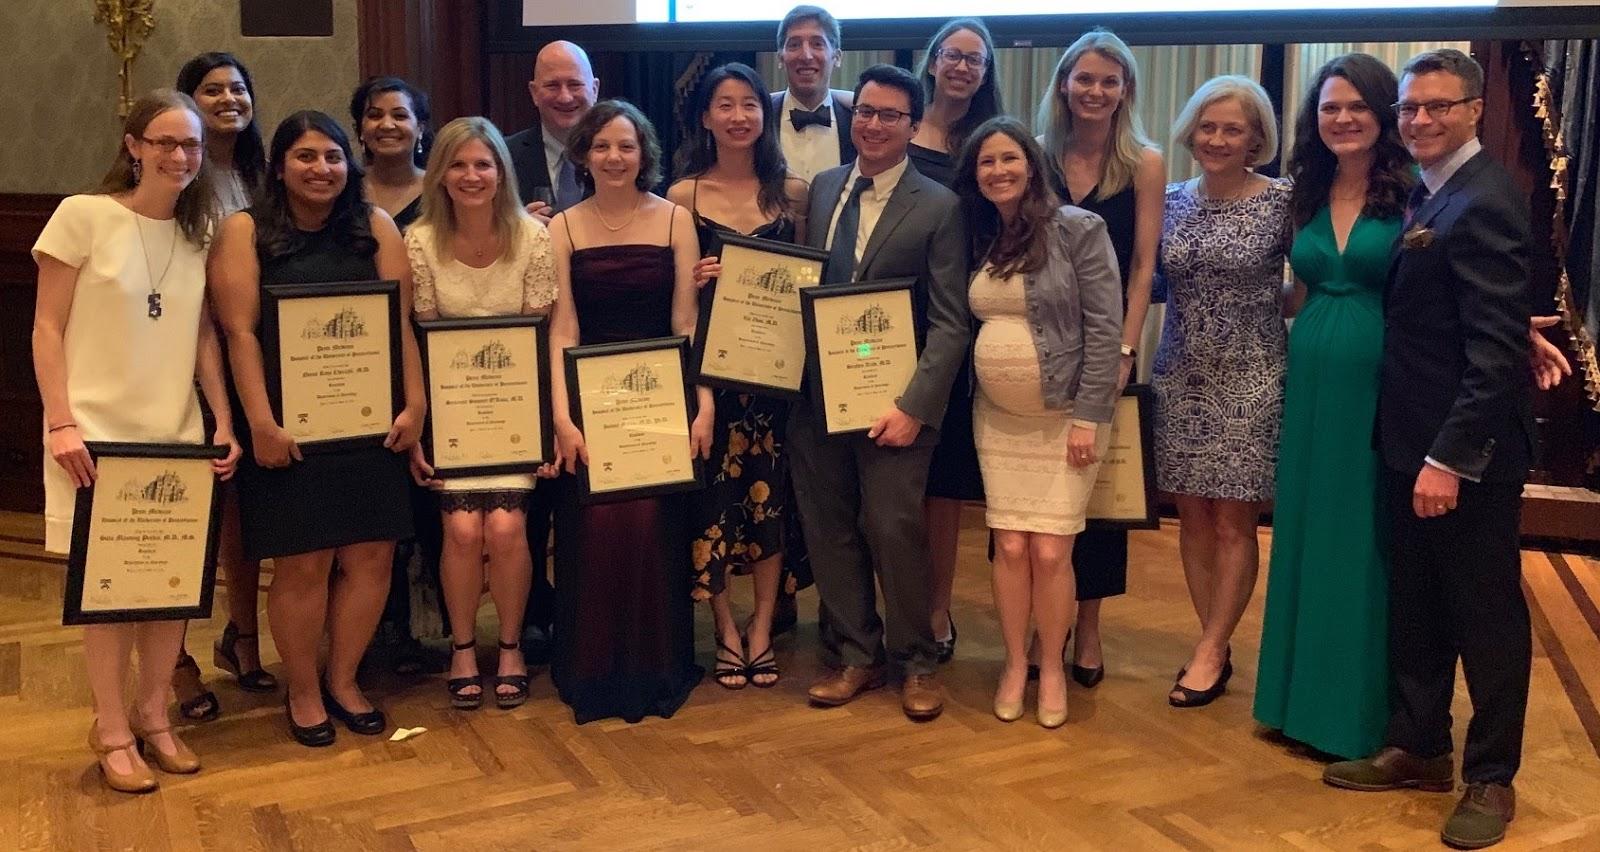 Penn Neurology Residency Program: Residents & Career Paths